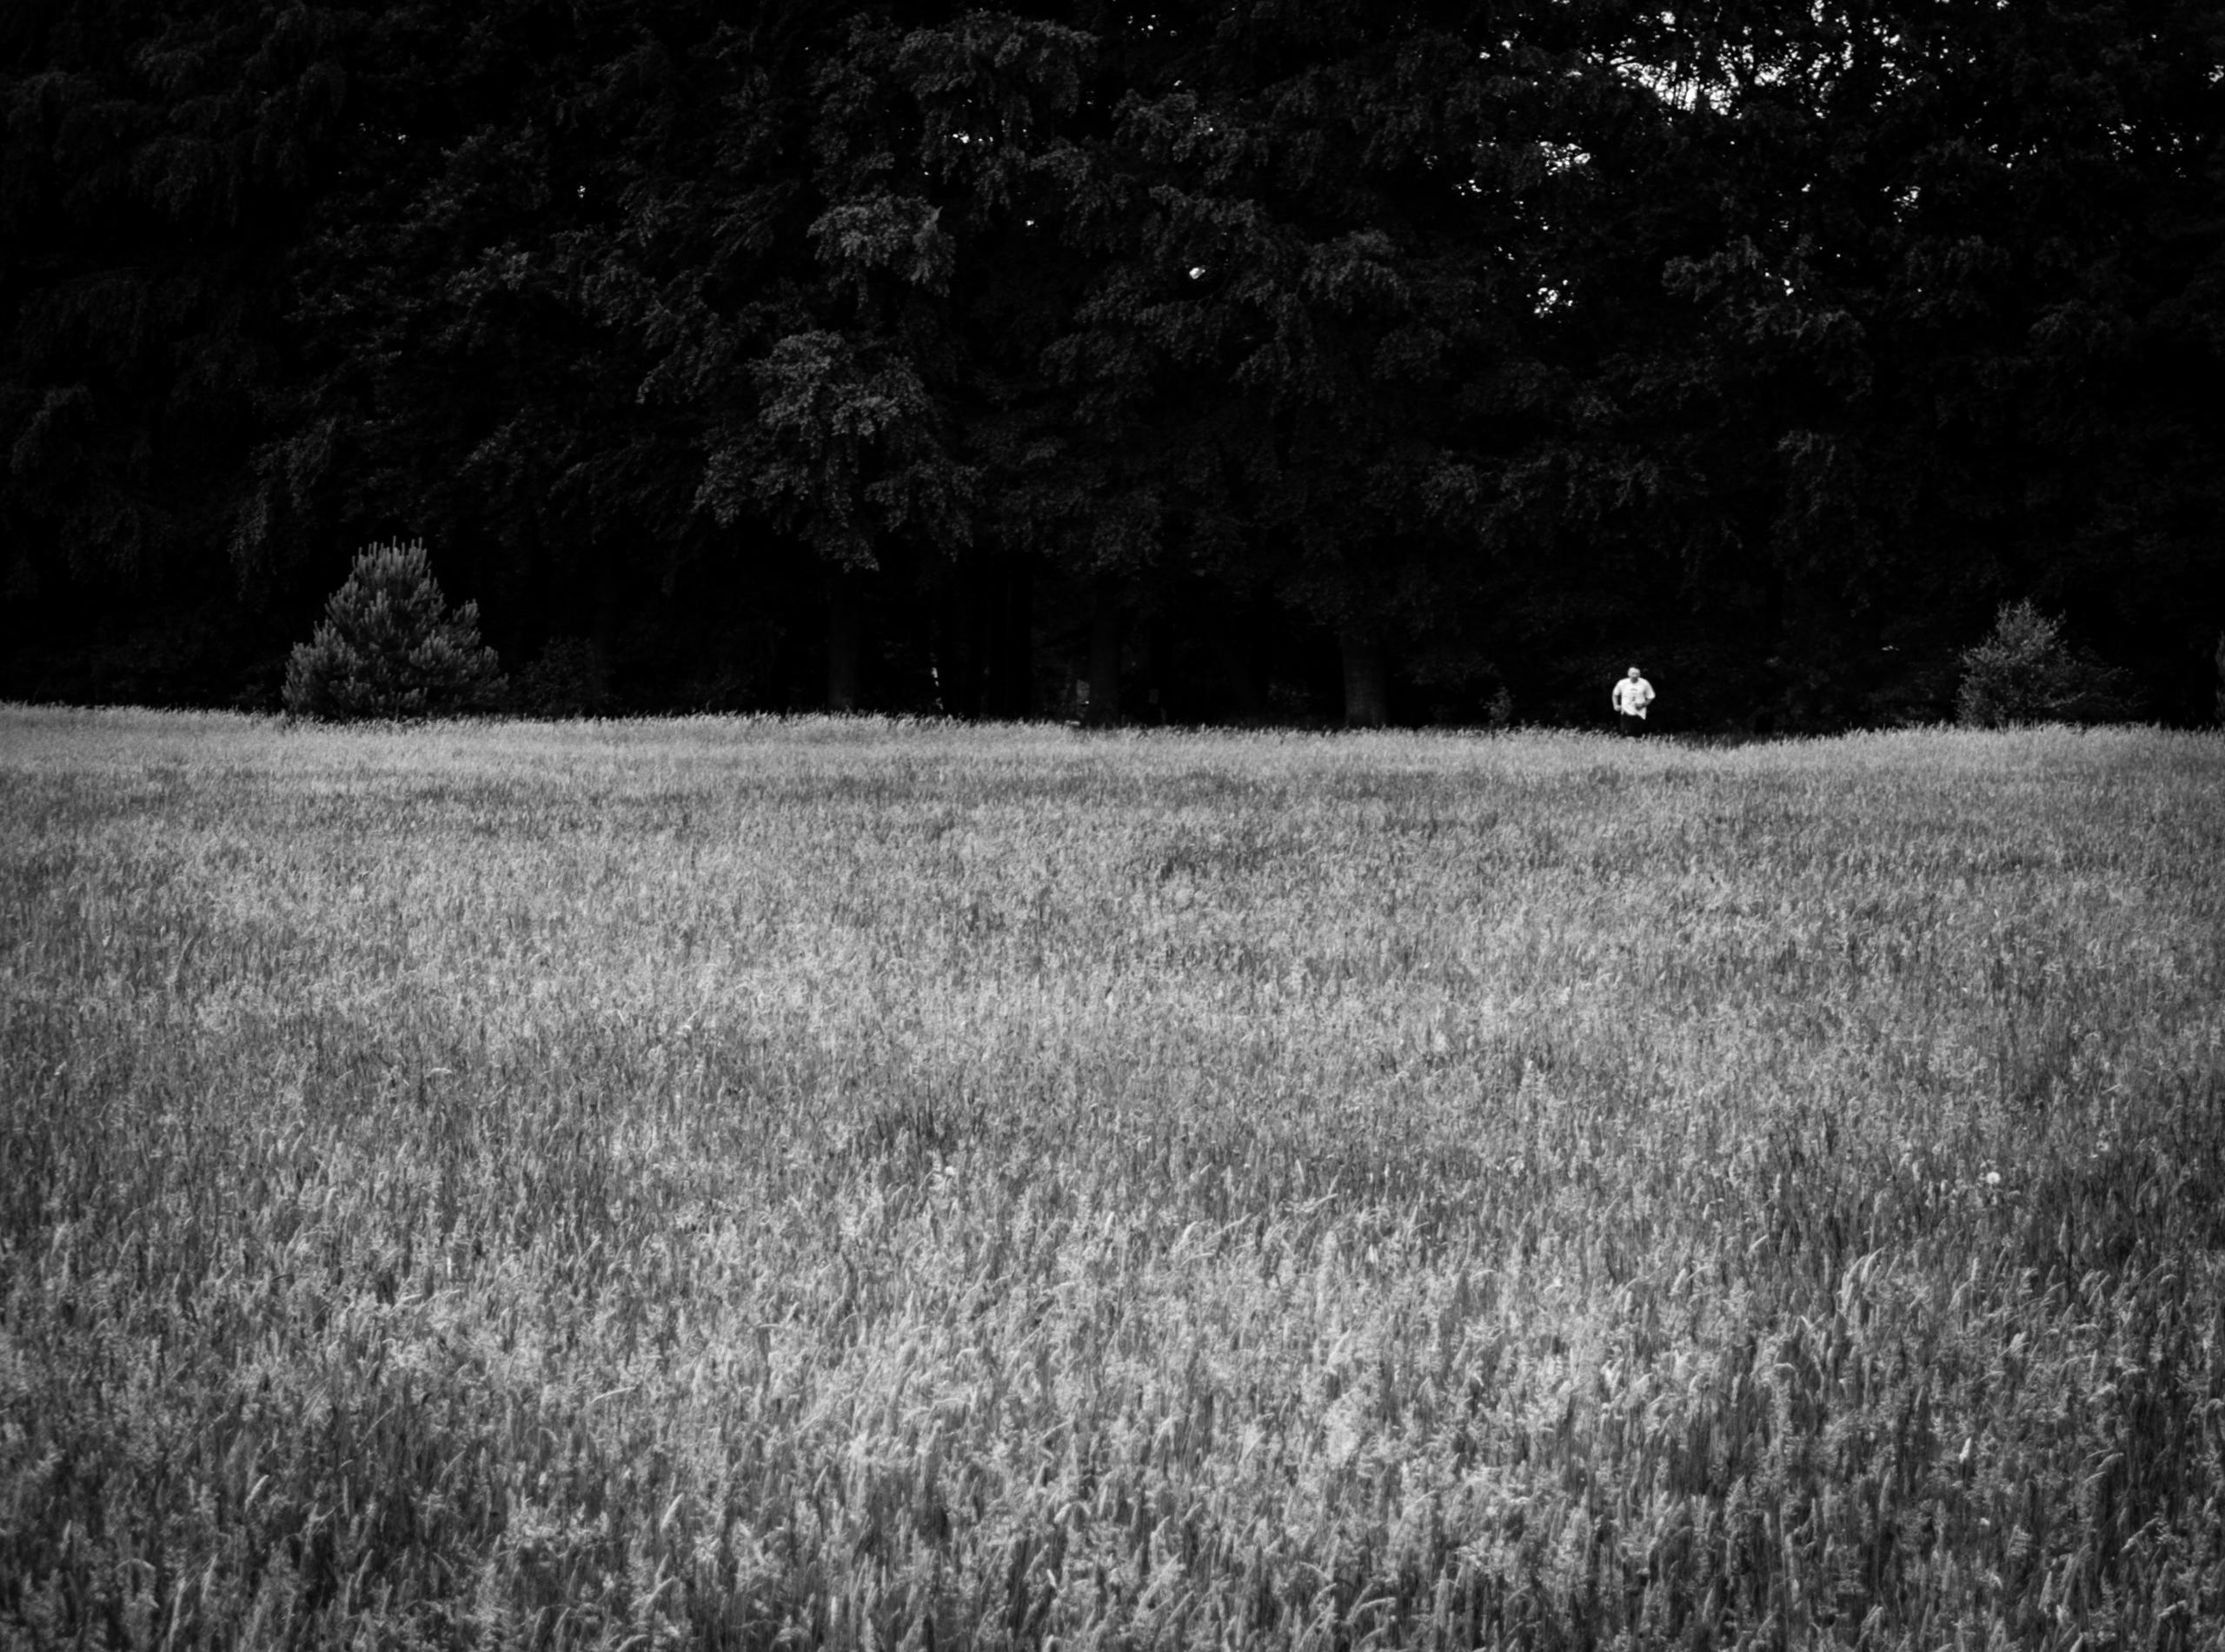 Running man - photography, blackandwhite - timondegraaff | ello